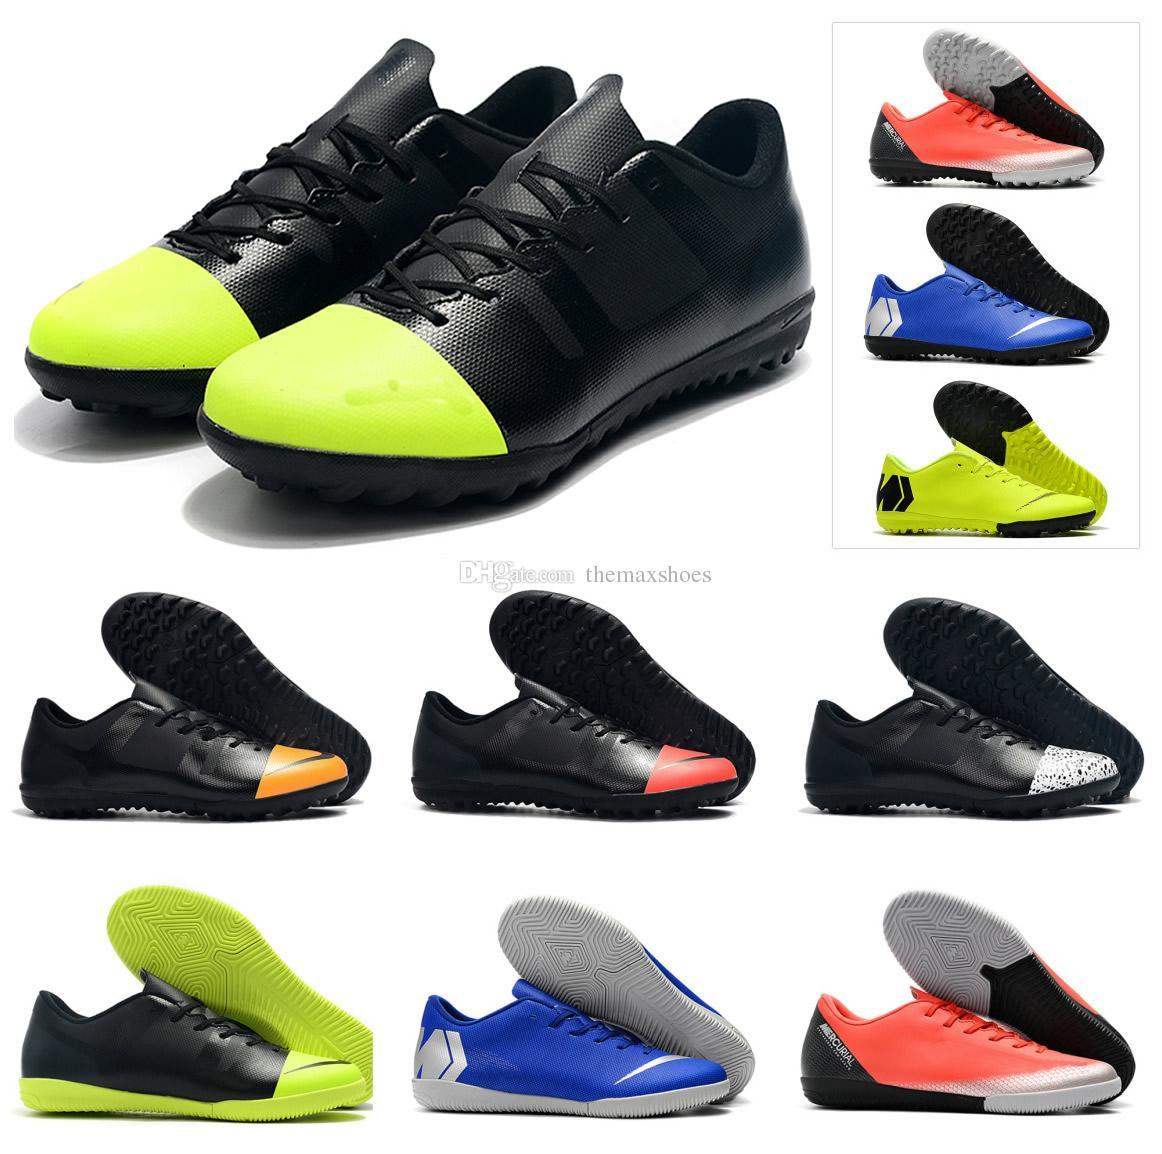 2840e621924 NEW Mens Mercurial VaporX 12 Club XII IC TF Turf Indoor Women Boys CR7  Ronaldo Neymar Low Ankle Football Soccer Shoes Cleats Size 36-45 Mercurial  VAPORX 12 ...